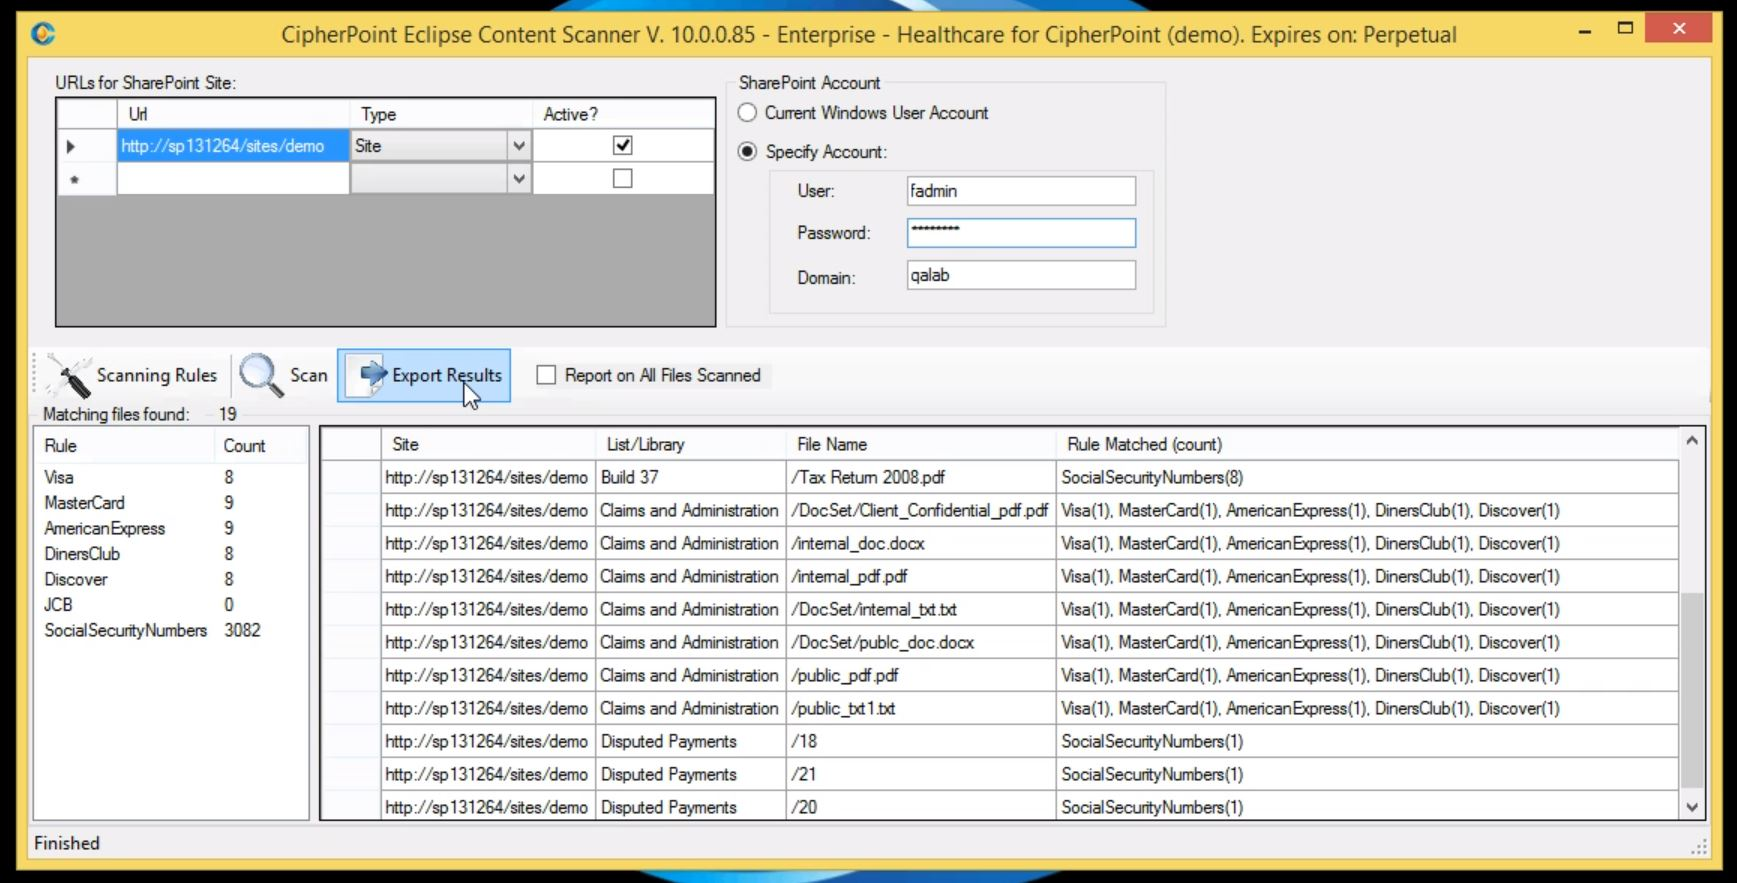 CipherPoint Eclipse Content Scanner